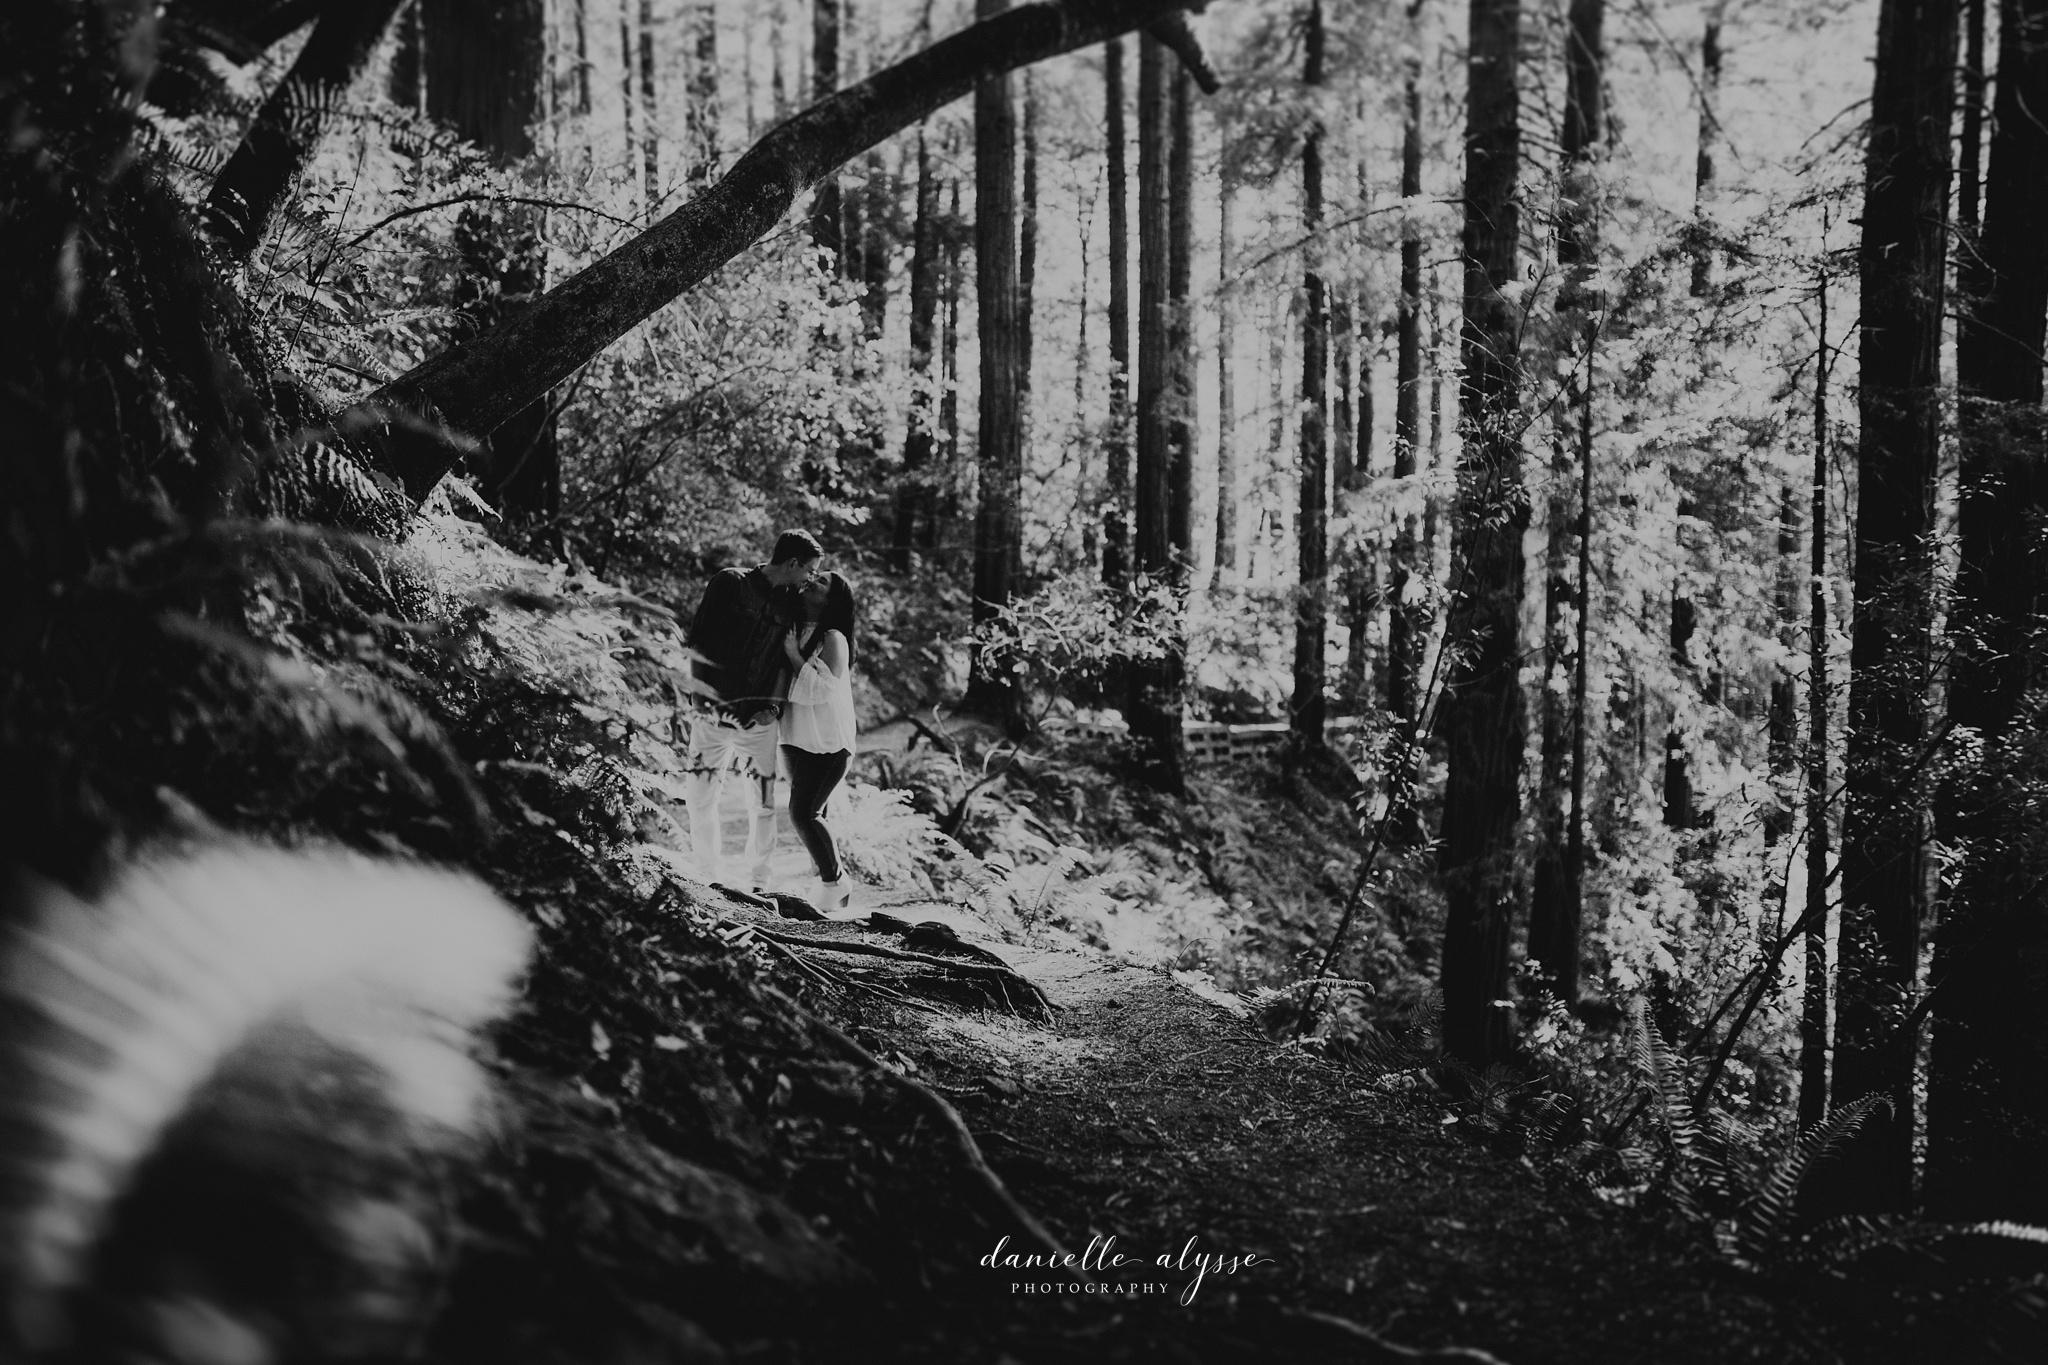 180503_engagement_bianca_muir_woods_mill_valley_danielle_alysse_photography_bay_area_photographer_blog_22_WEB.jpg